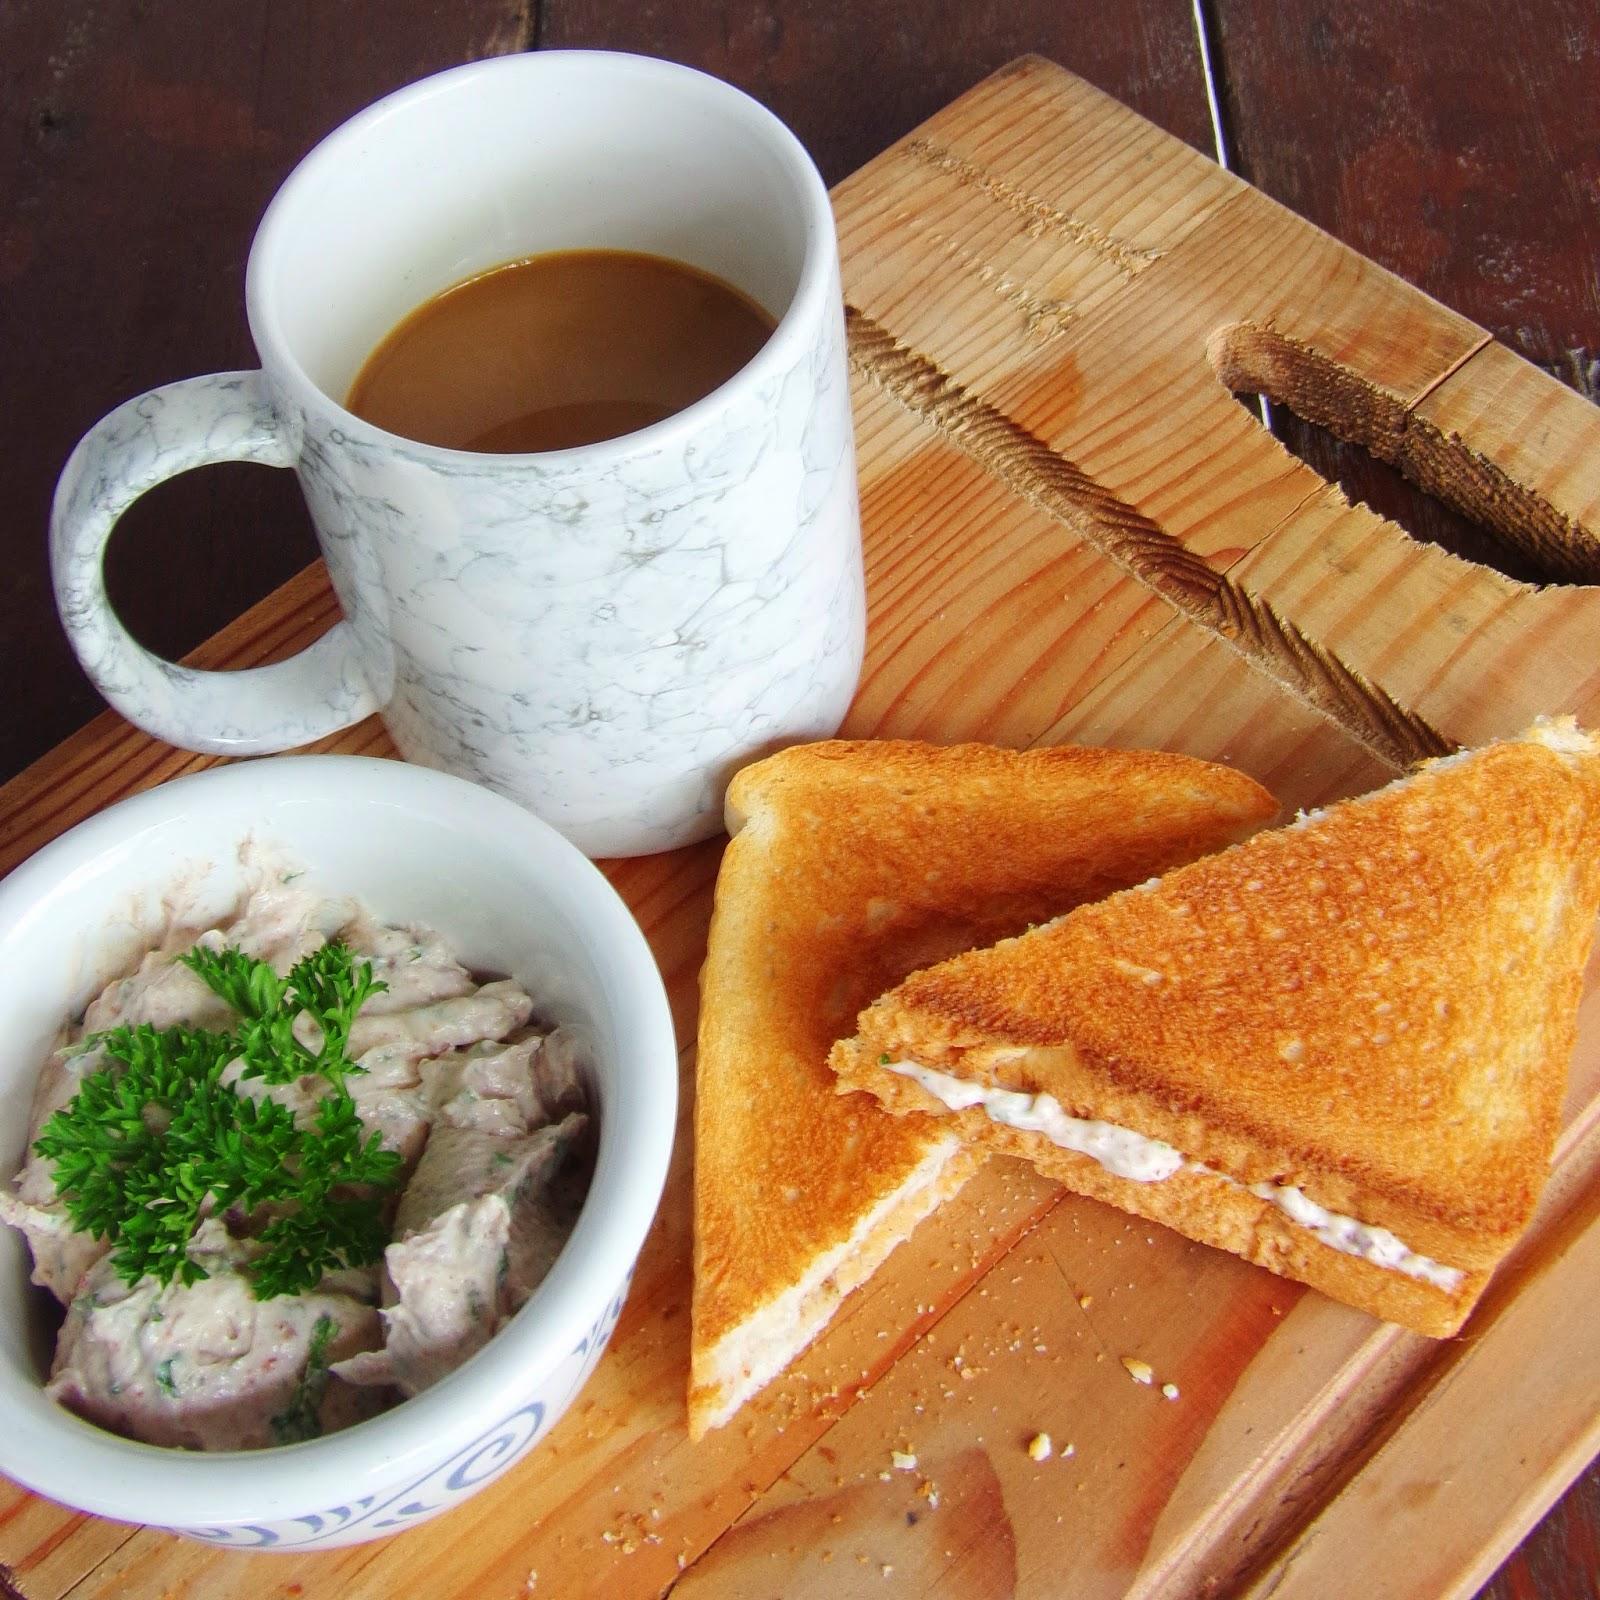 cream cheese sandwich recipes, cream cheese sandwich spread, cream cheese recipes, cream cheese appetizers, recipes with cream cheese